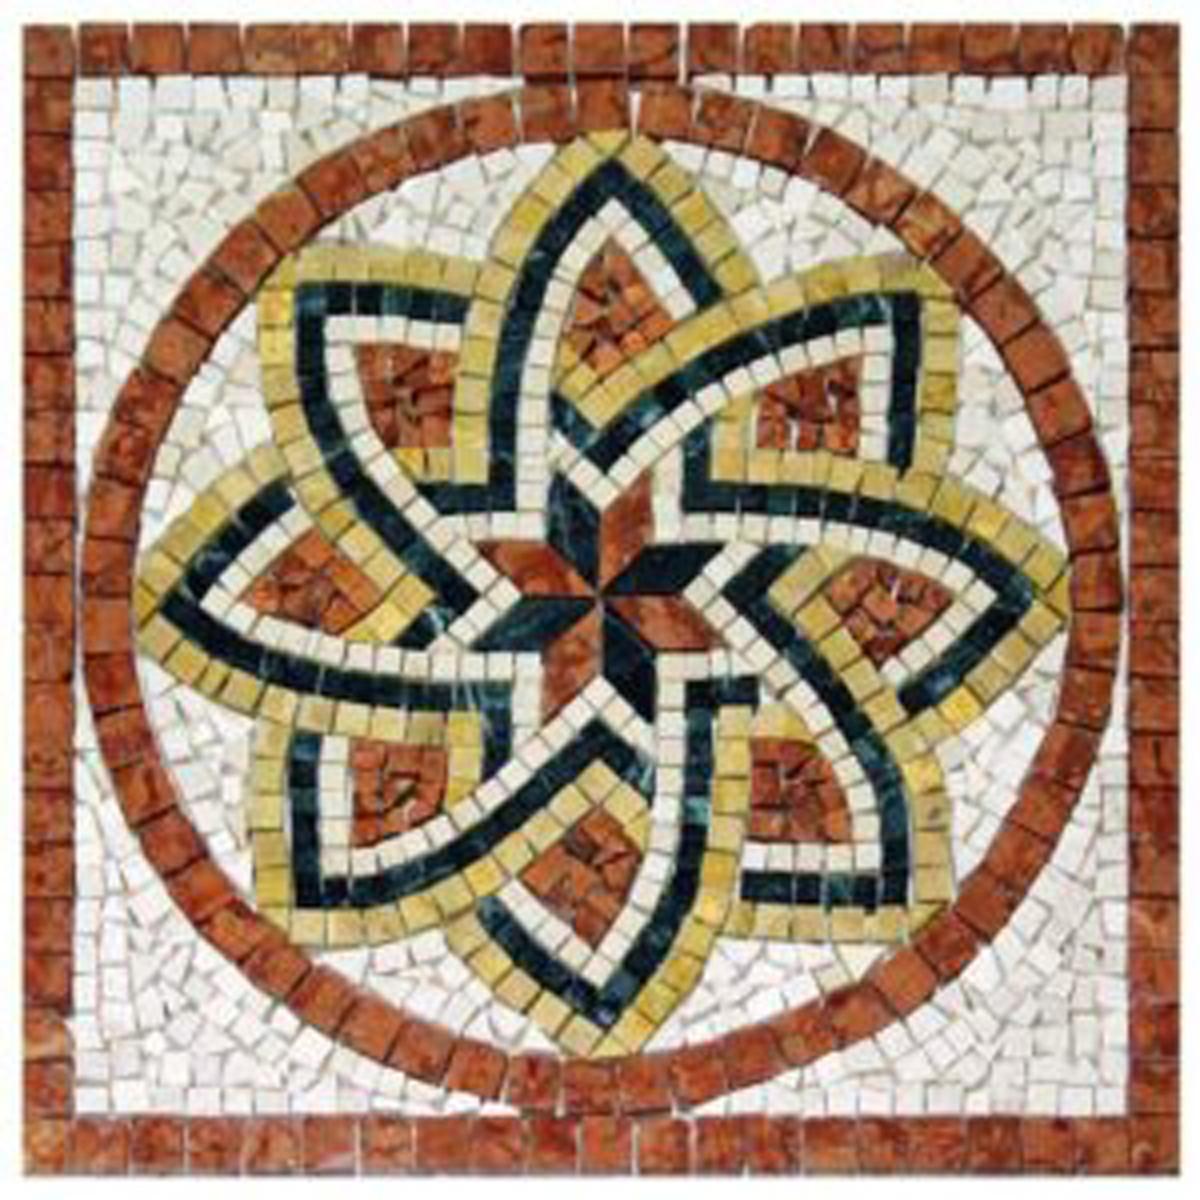 Rosoni rosone mosaico in marmo su rete per interni esterni 80x80 FLORIUM ROSSO